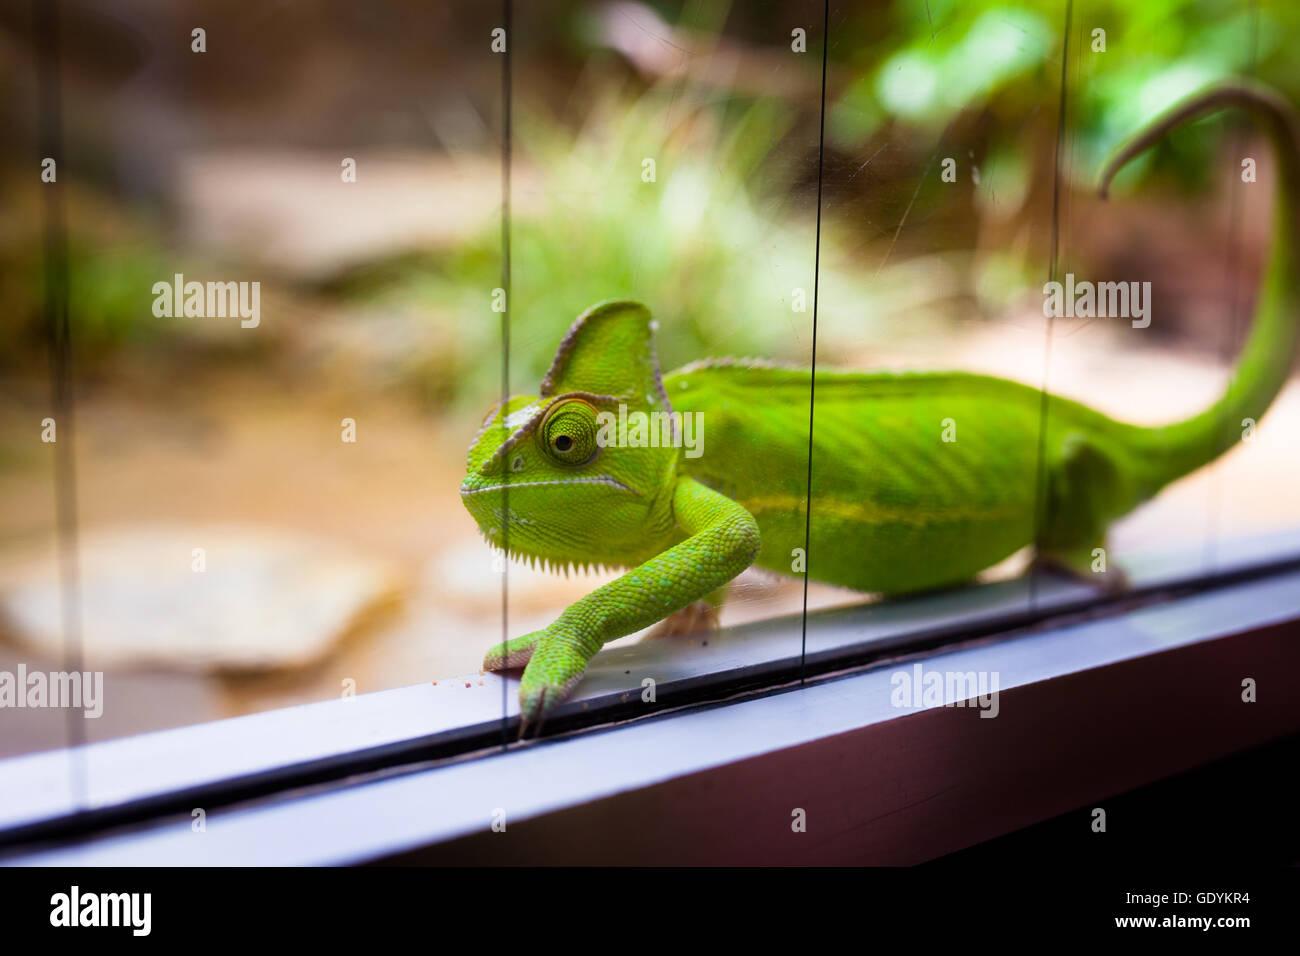 Chameleon In Glass Terrarium At Zoo Stock Photo 111860984 Alamy